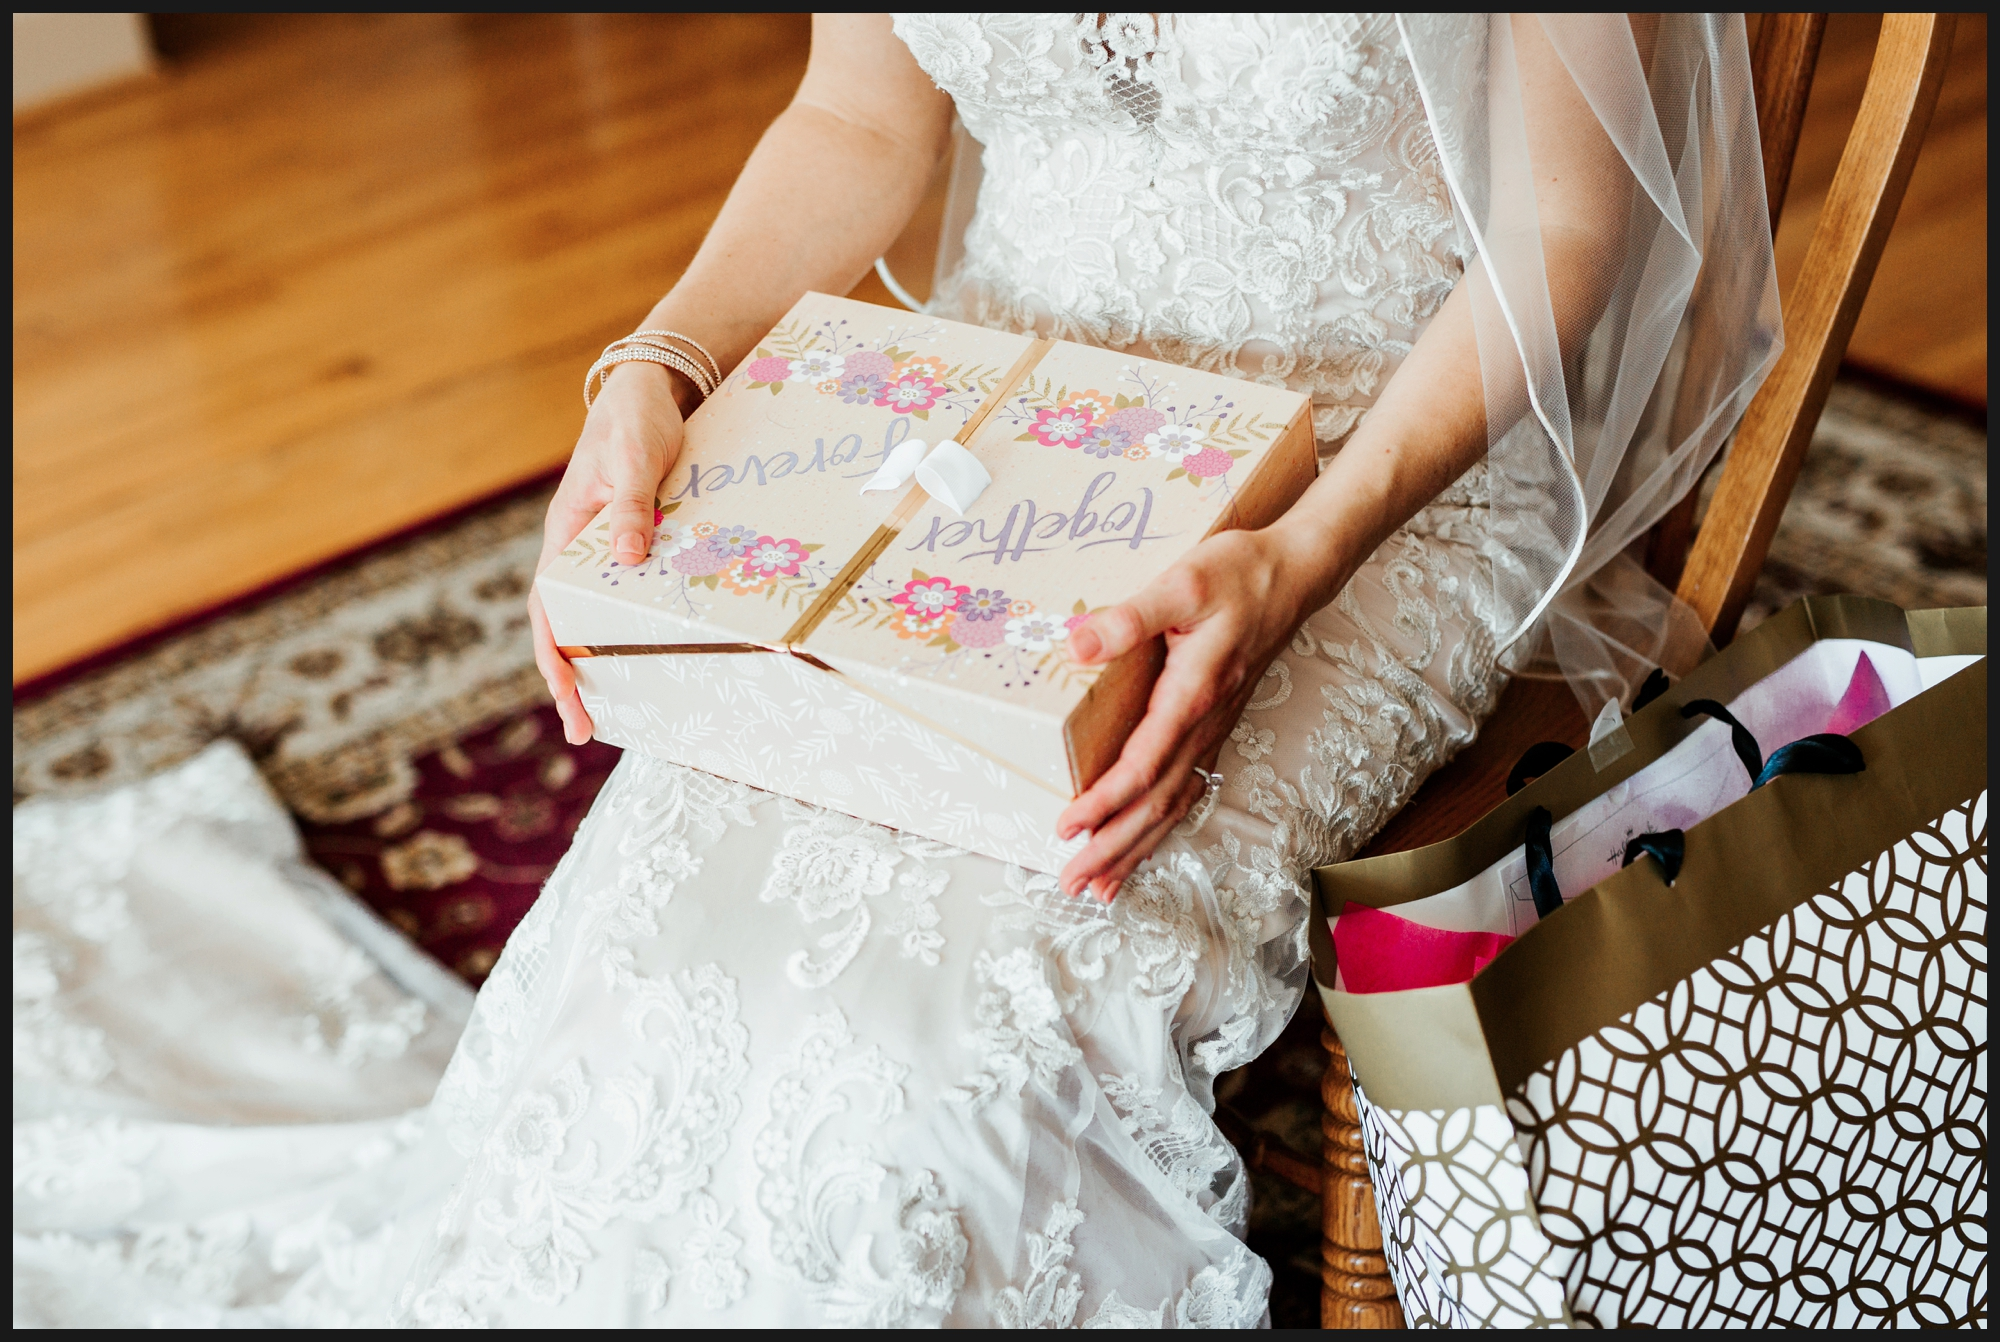 Orlando-Wedding-Photographer-destination-wedding-photographer-florida-wedding-photographer-hawaii-wedding-photographer_0571.jpg